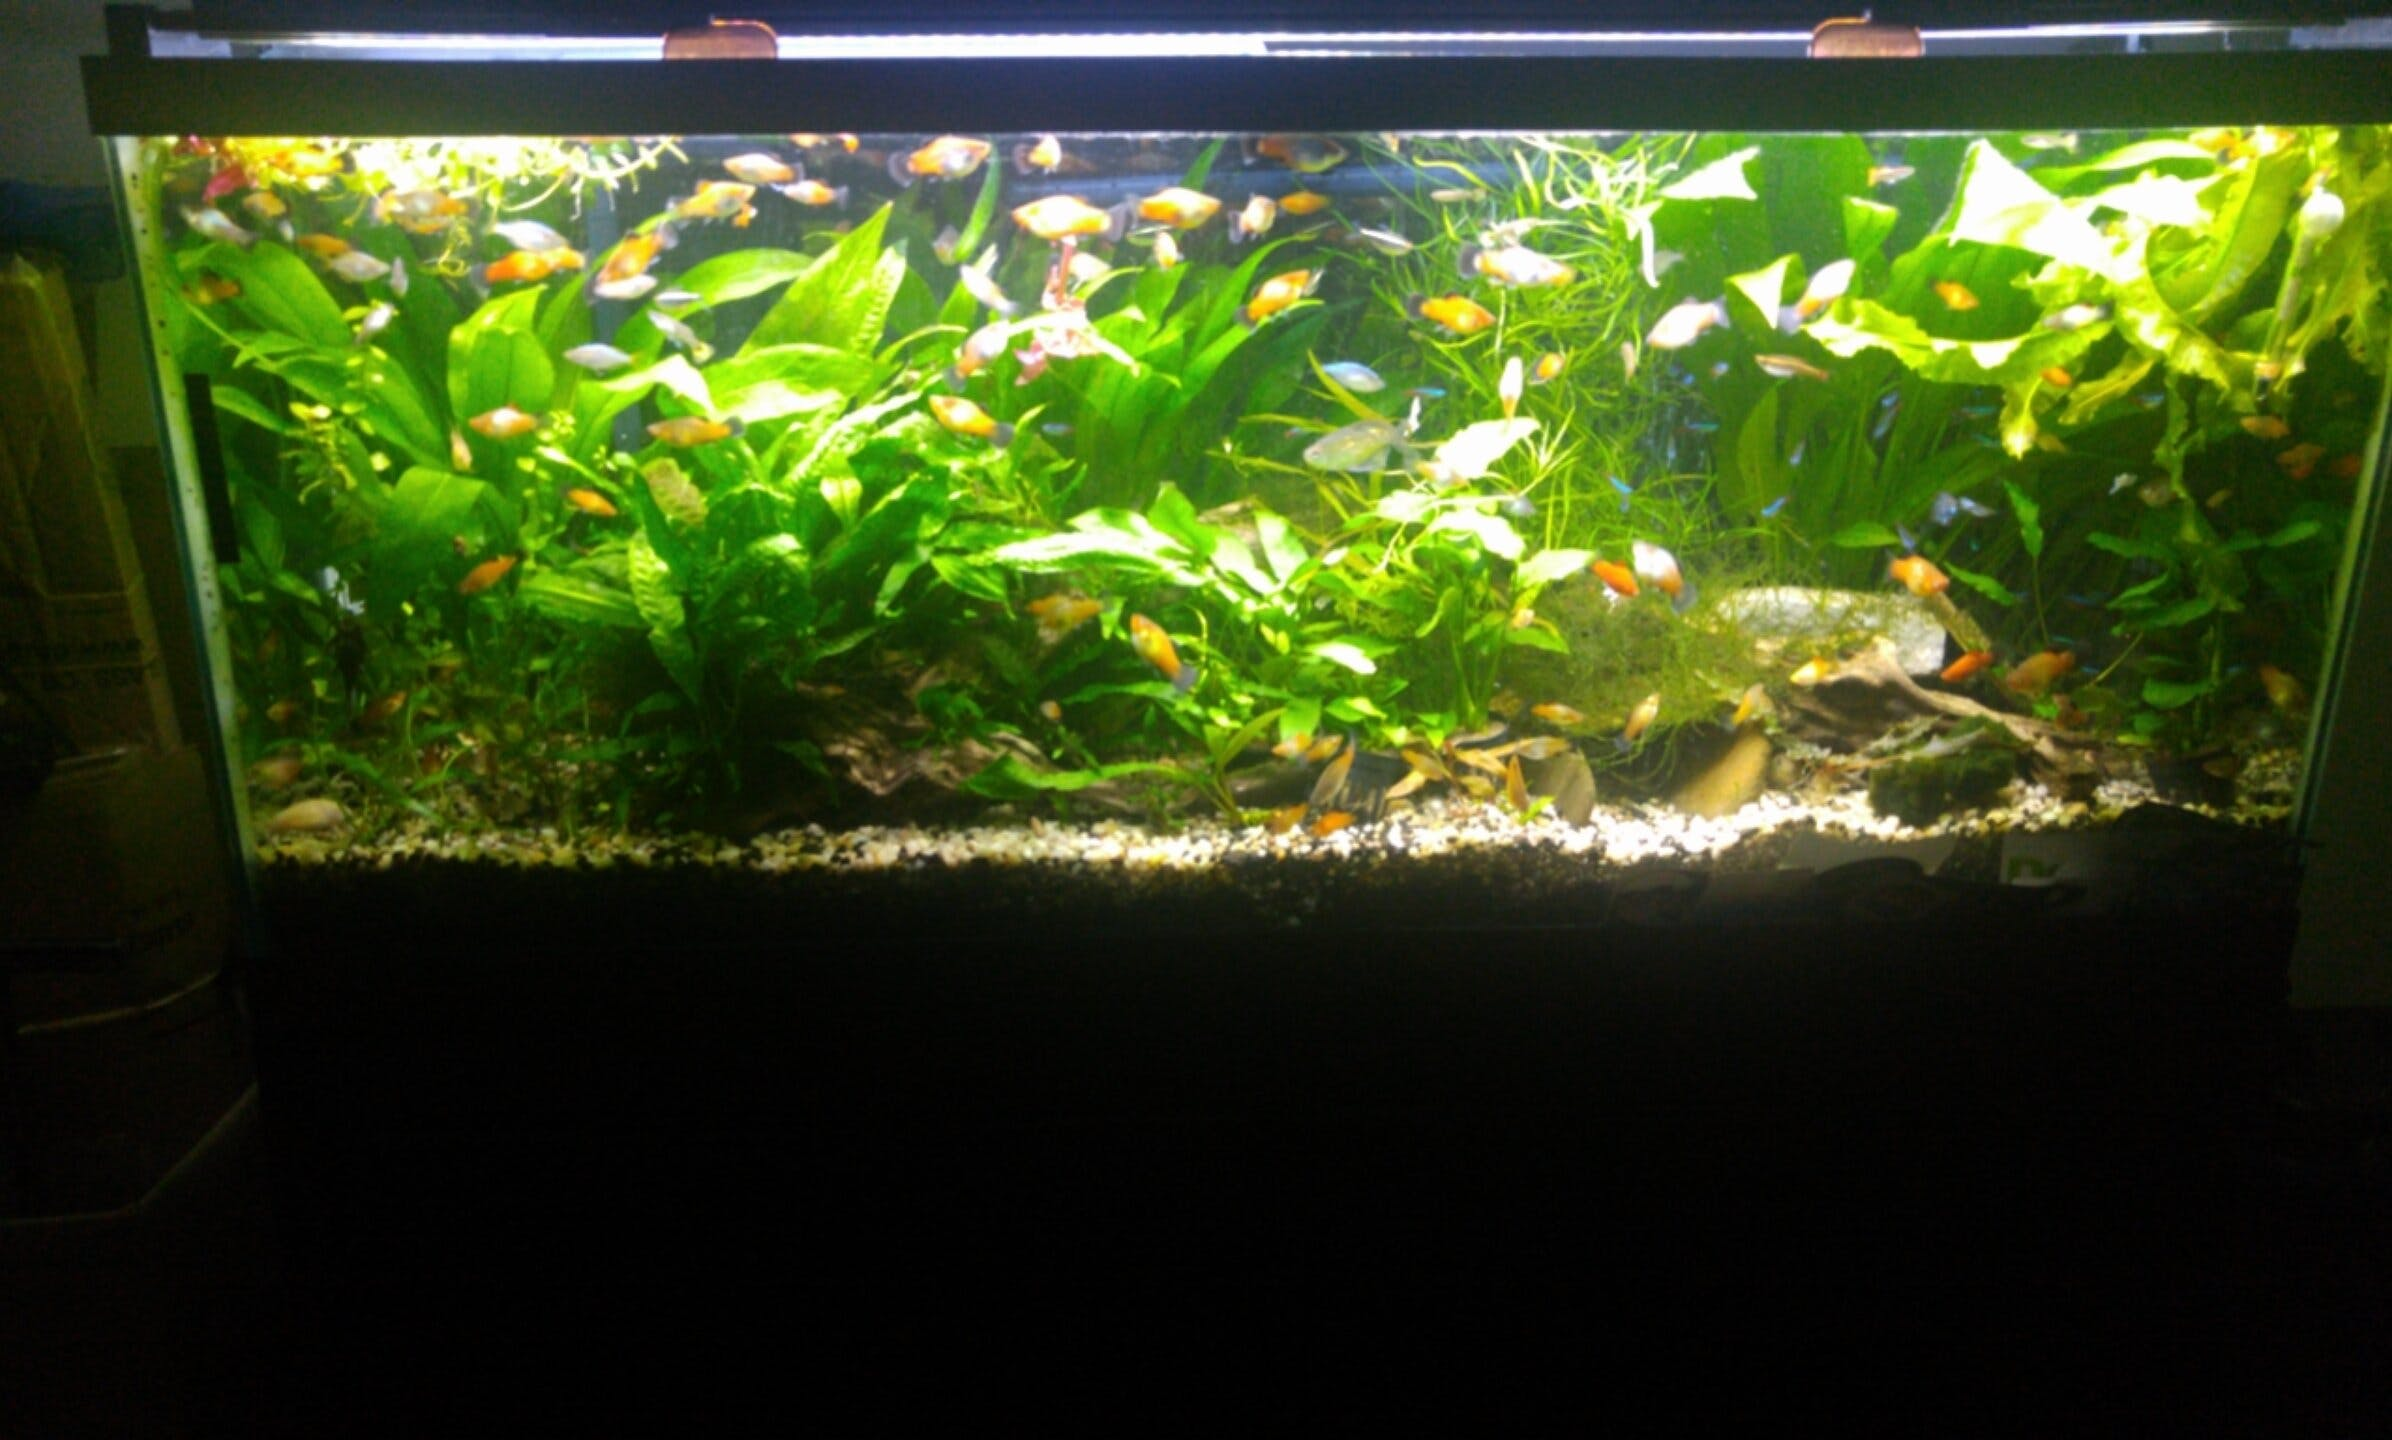 aquarium plant lighting marineland aquatic plant led. Black Bedroom Furniture Sets. Home Design Ideas